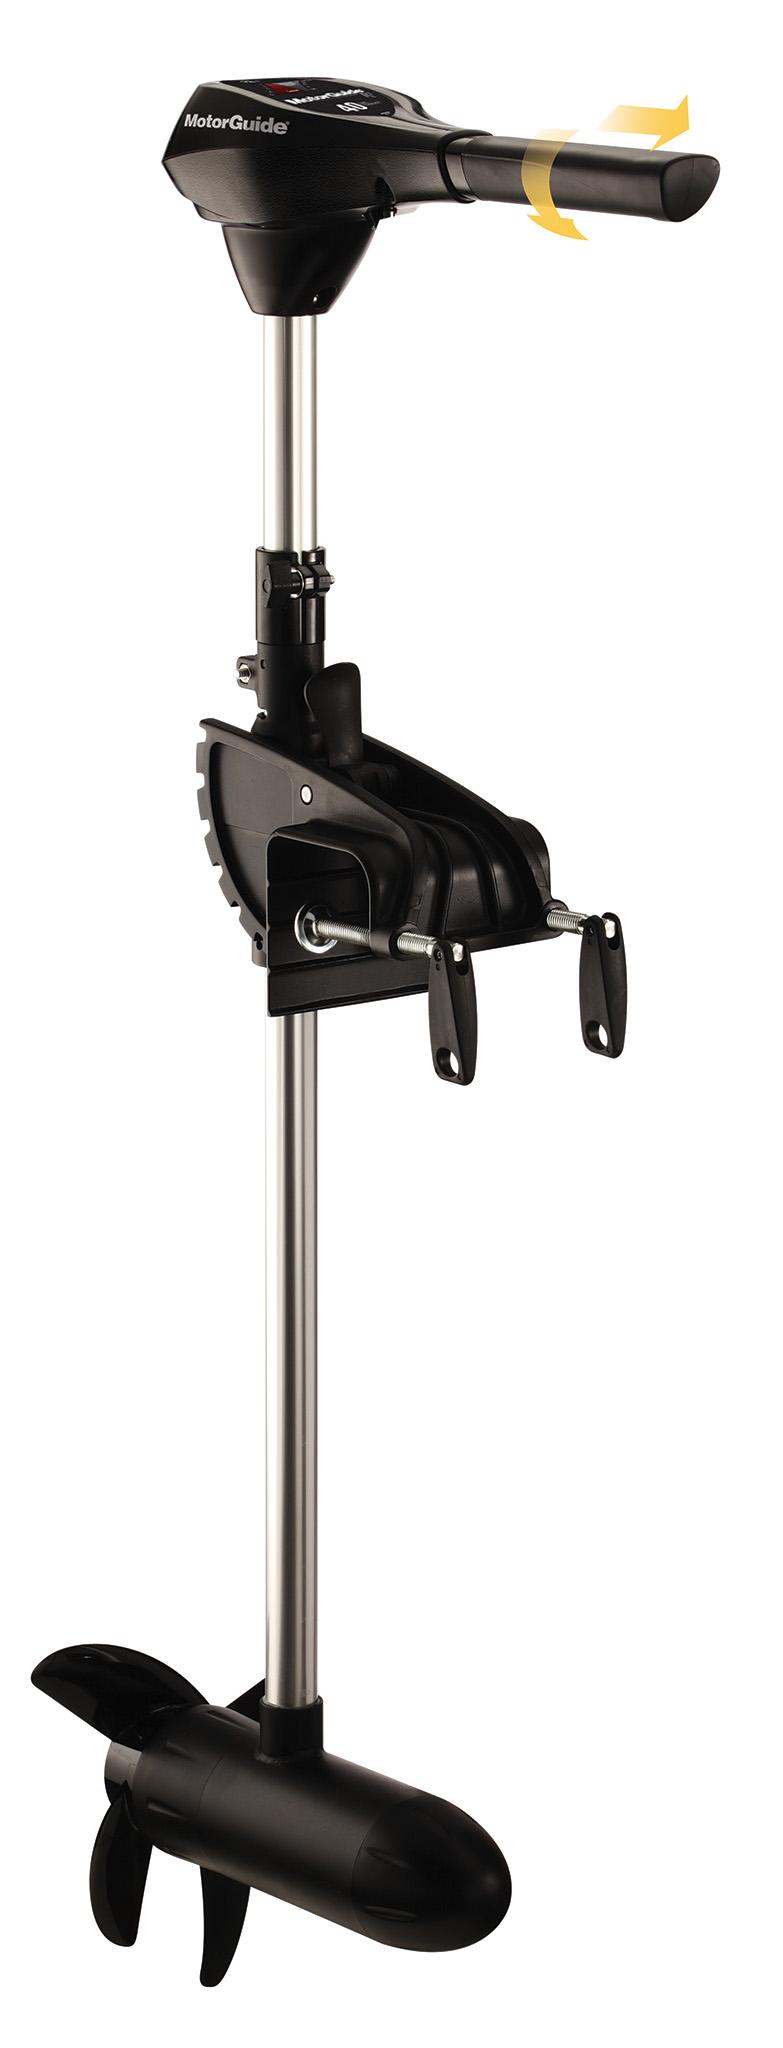 MotorGuide R3 - 40 HT 36 Heckmontage, Stufengeschaltet – Bild 2